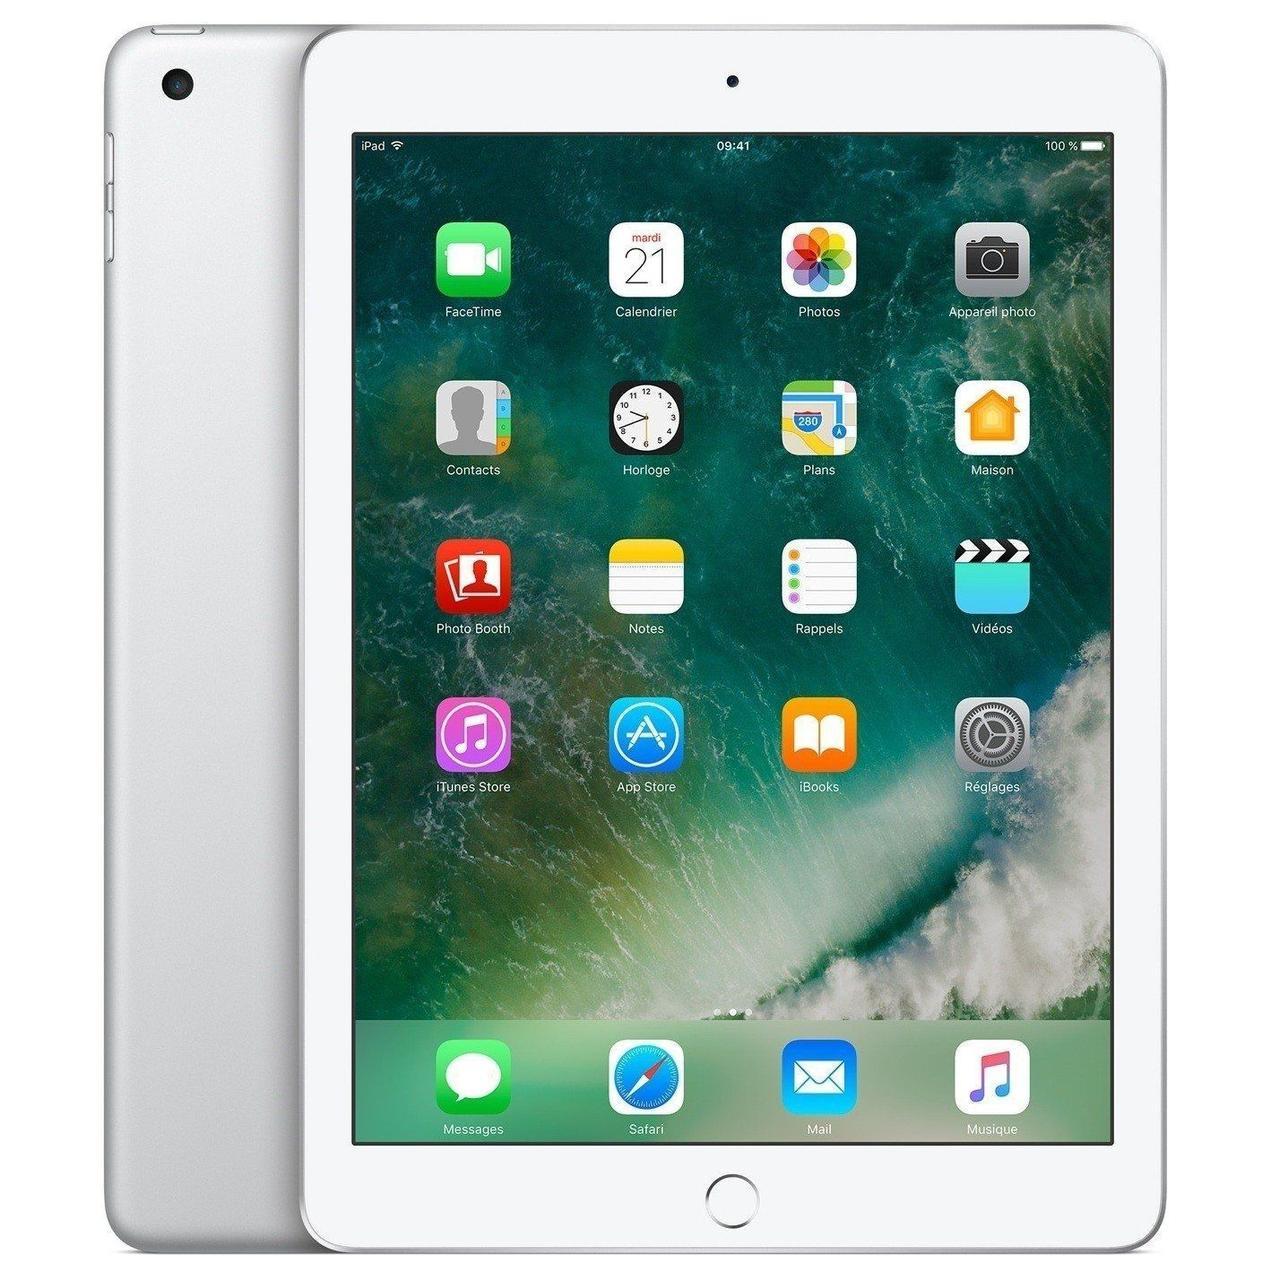 Apple iPad WiFi + Cellular 128Gb Silver (MR732) (2018)